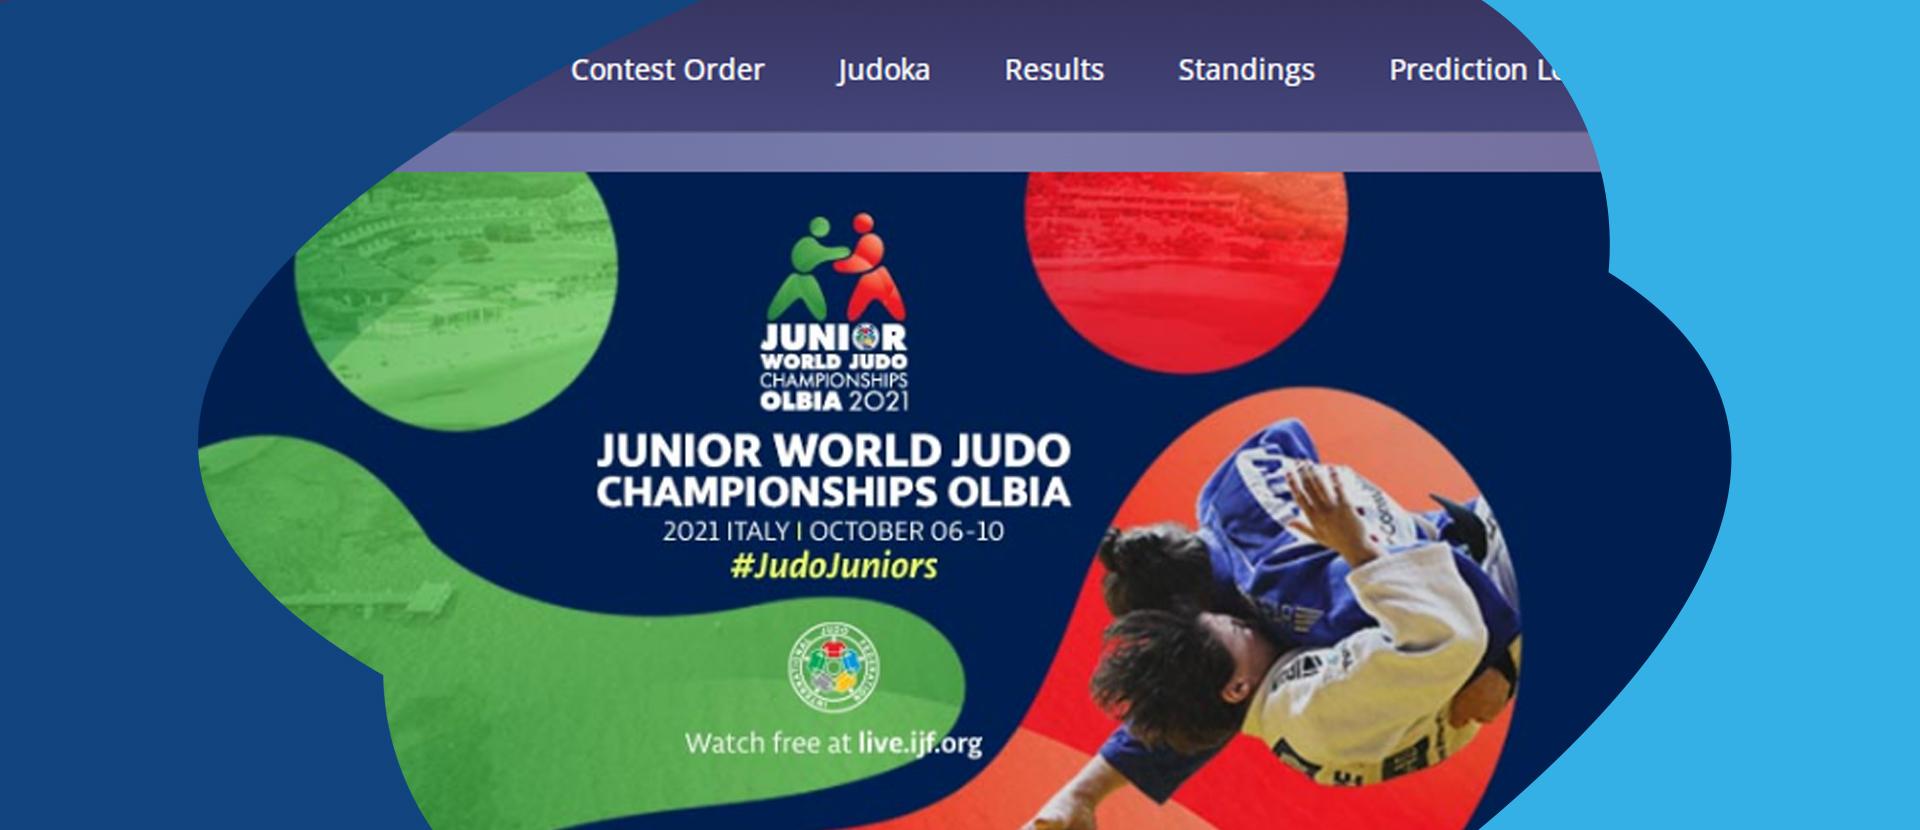 Judo Juniors World Championships 2021